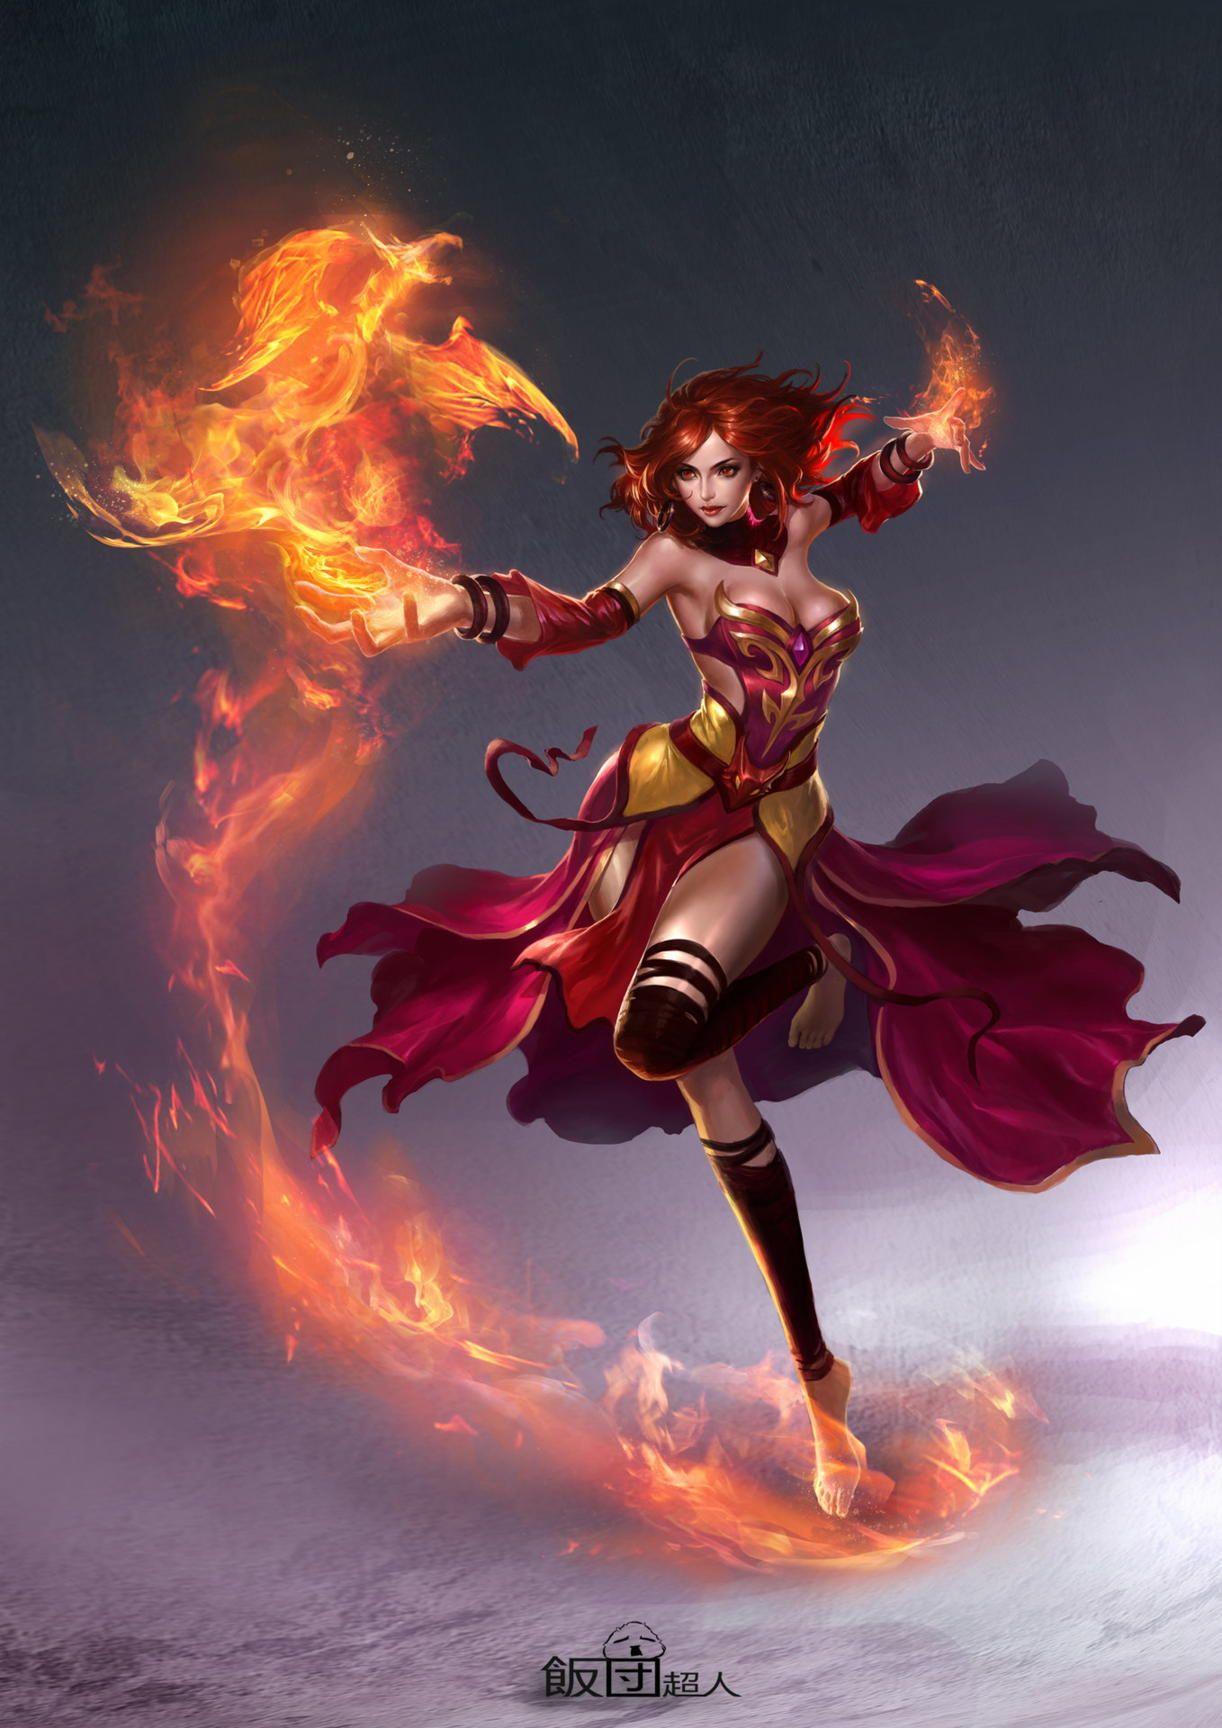 Lina – Character design